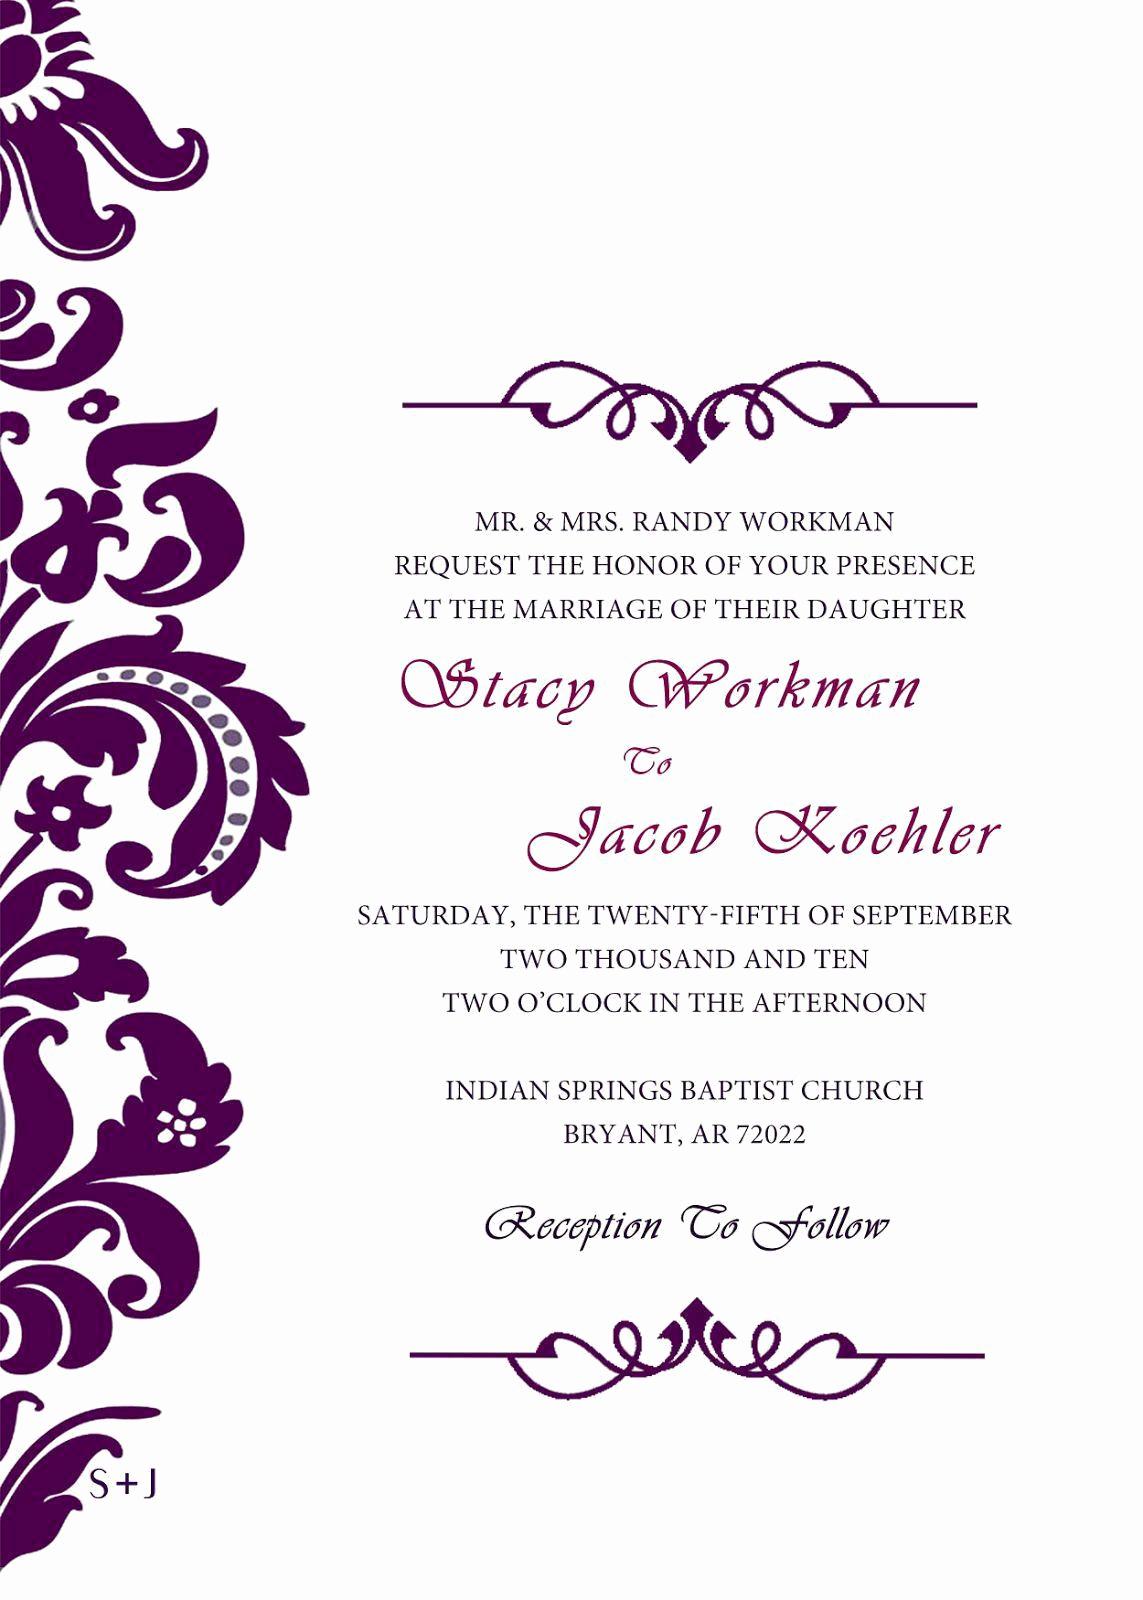 Wedding Invitation Templates Free Beautiful Best Invitation Cards Unique Wedding Invitation Card